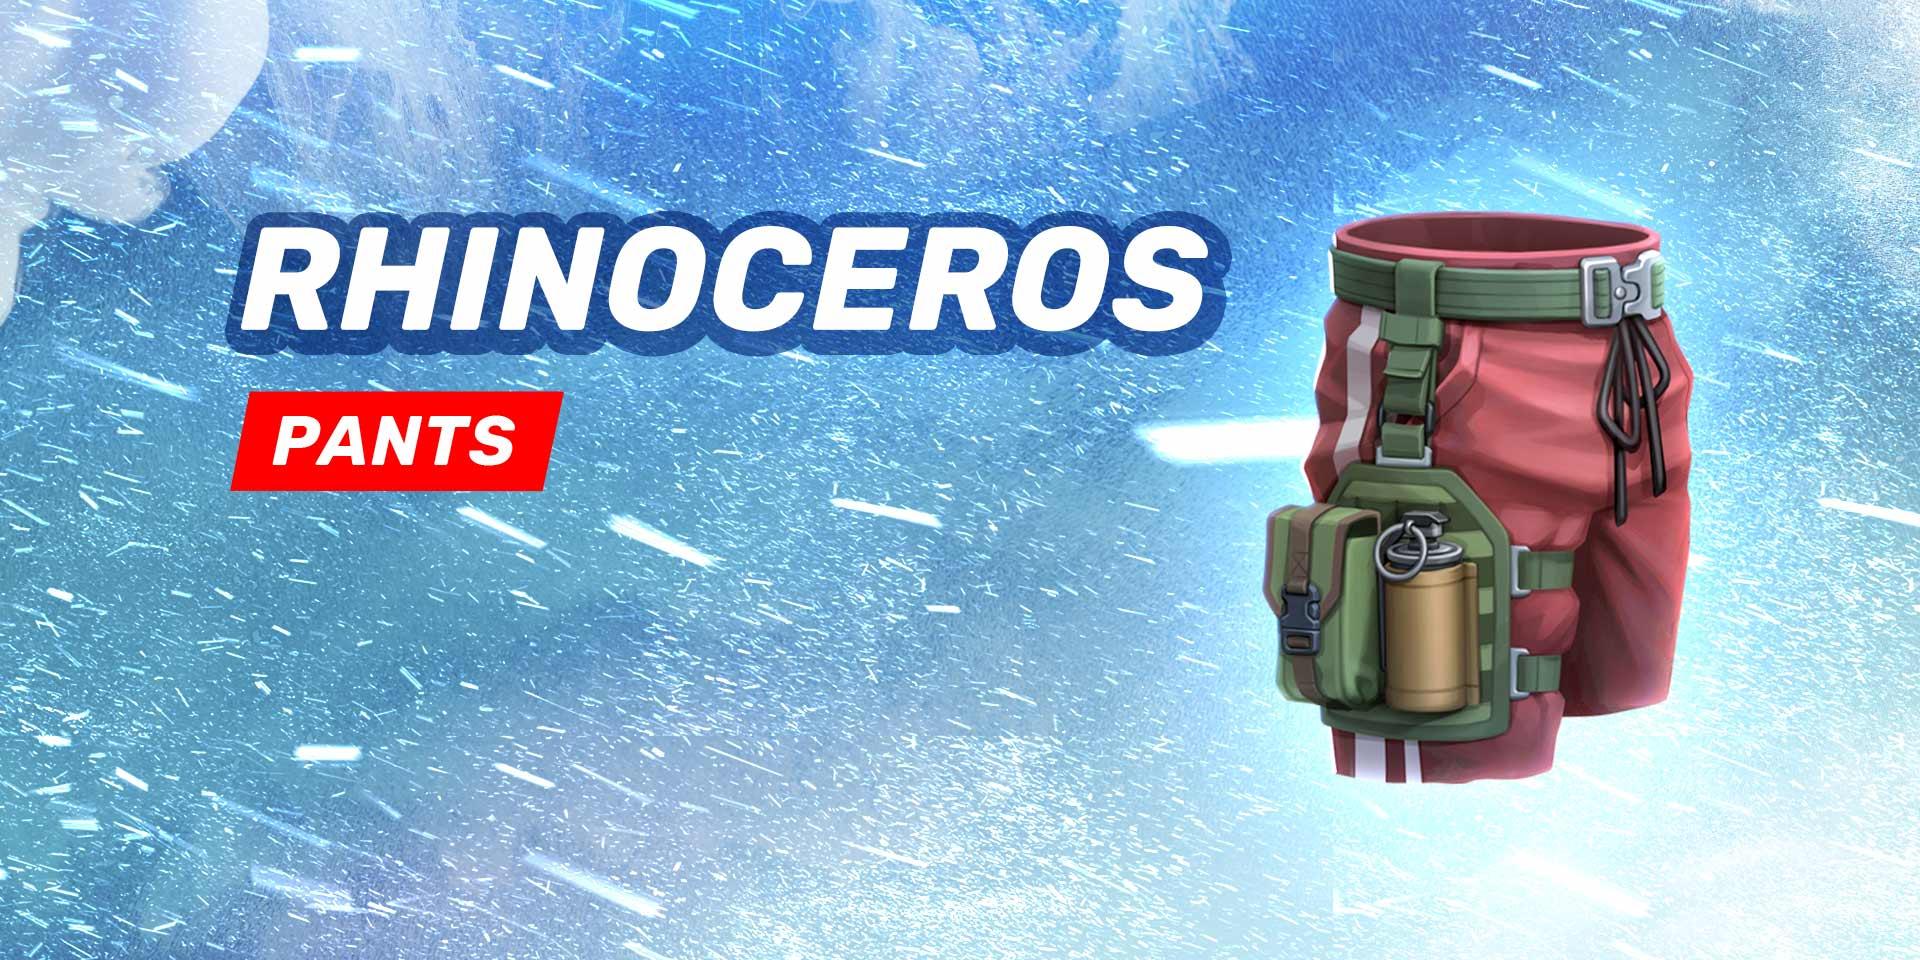 5fff0c898e44d_act2-s1-gunsopedia_Rhinoceros_header_EN